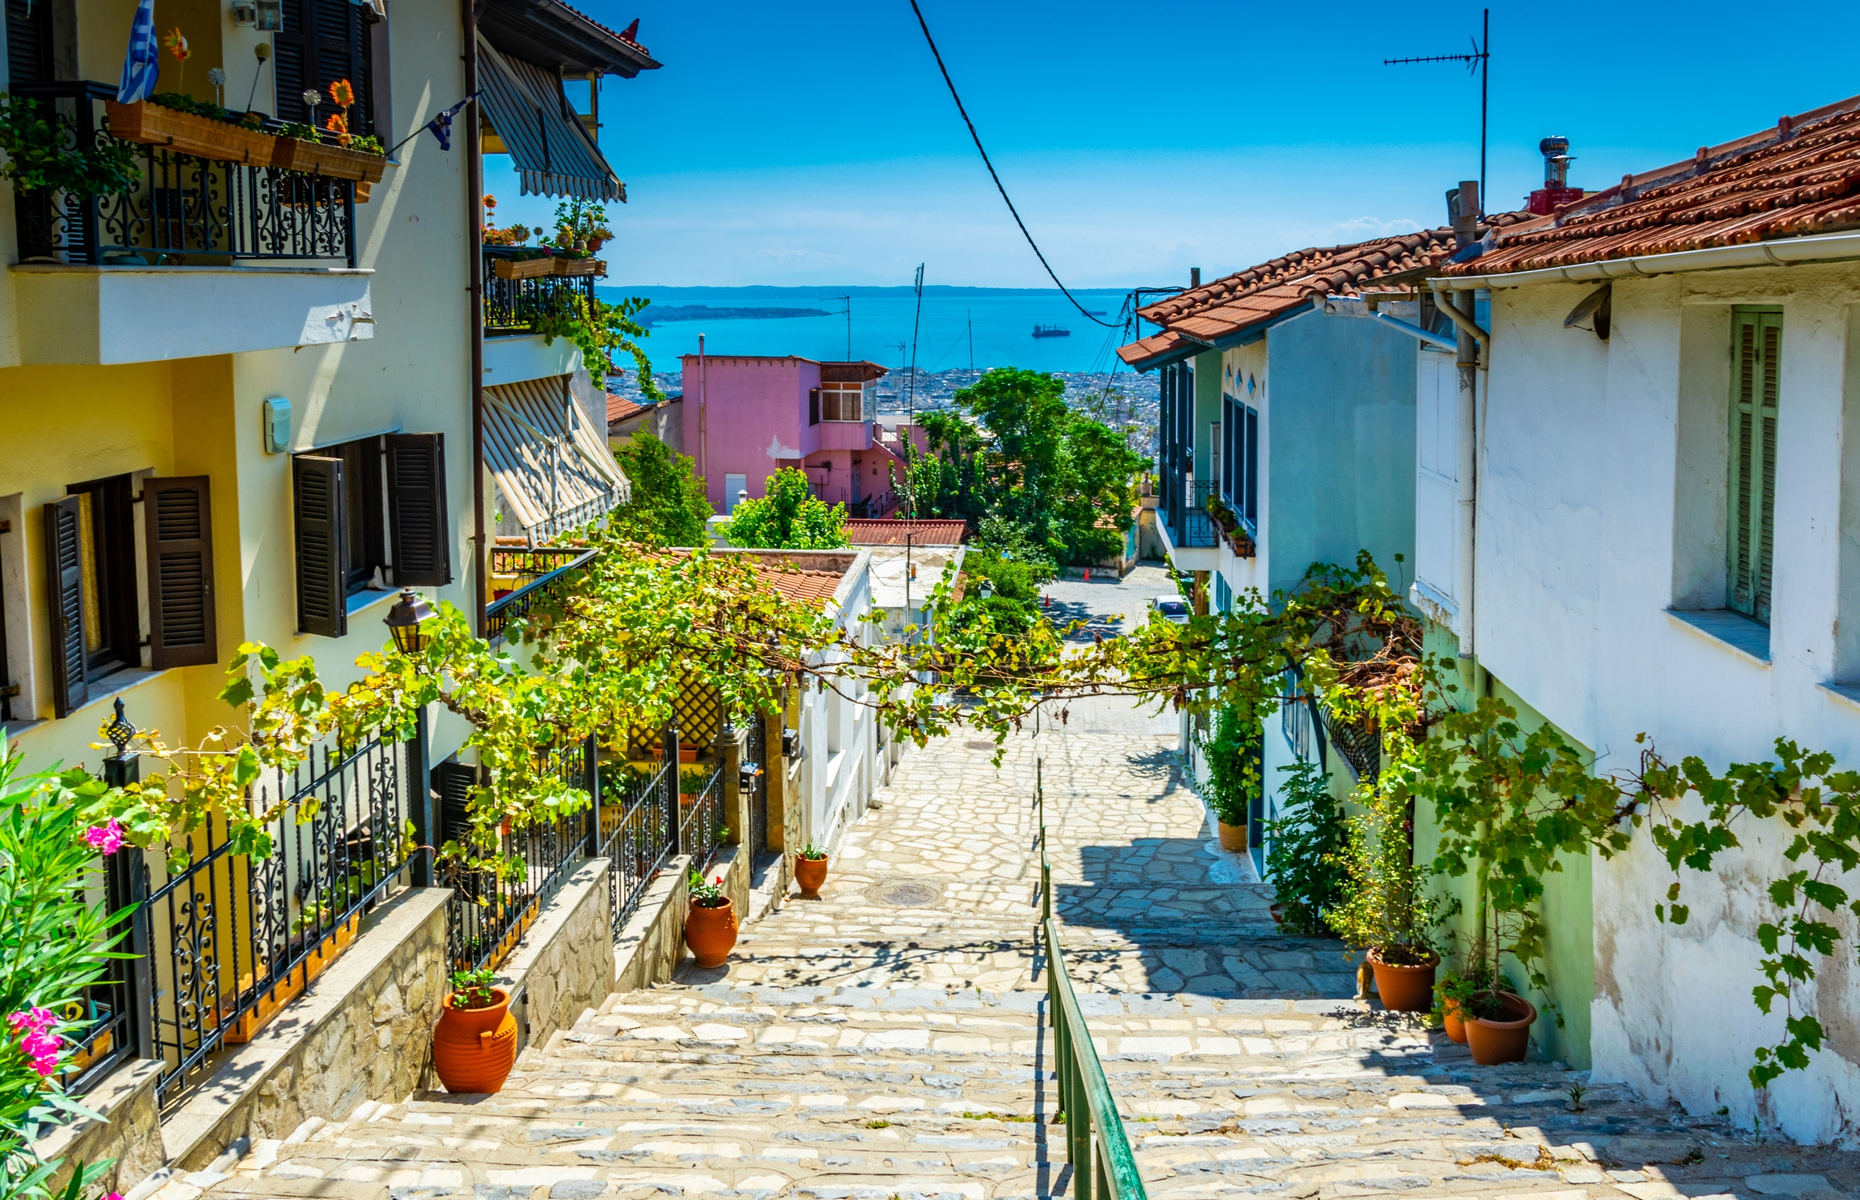 Street in Thessaloniki (Image: Trabantos/Shutterstock)